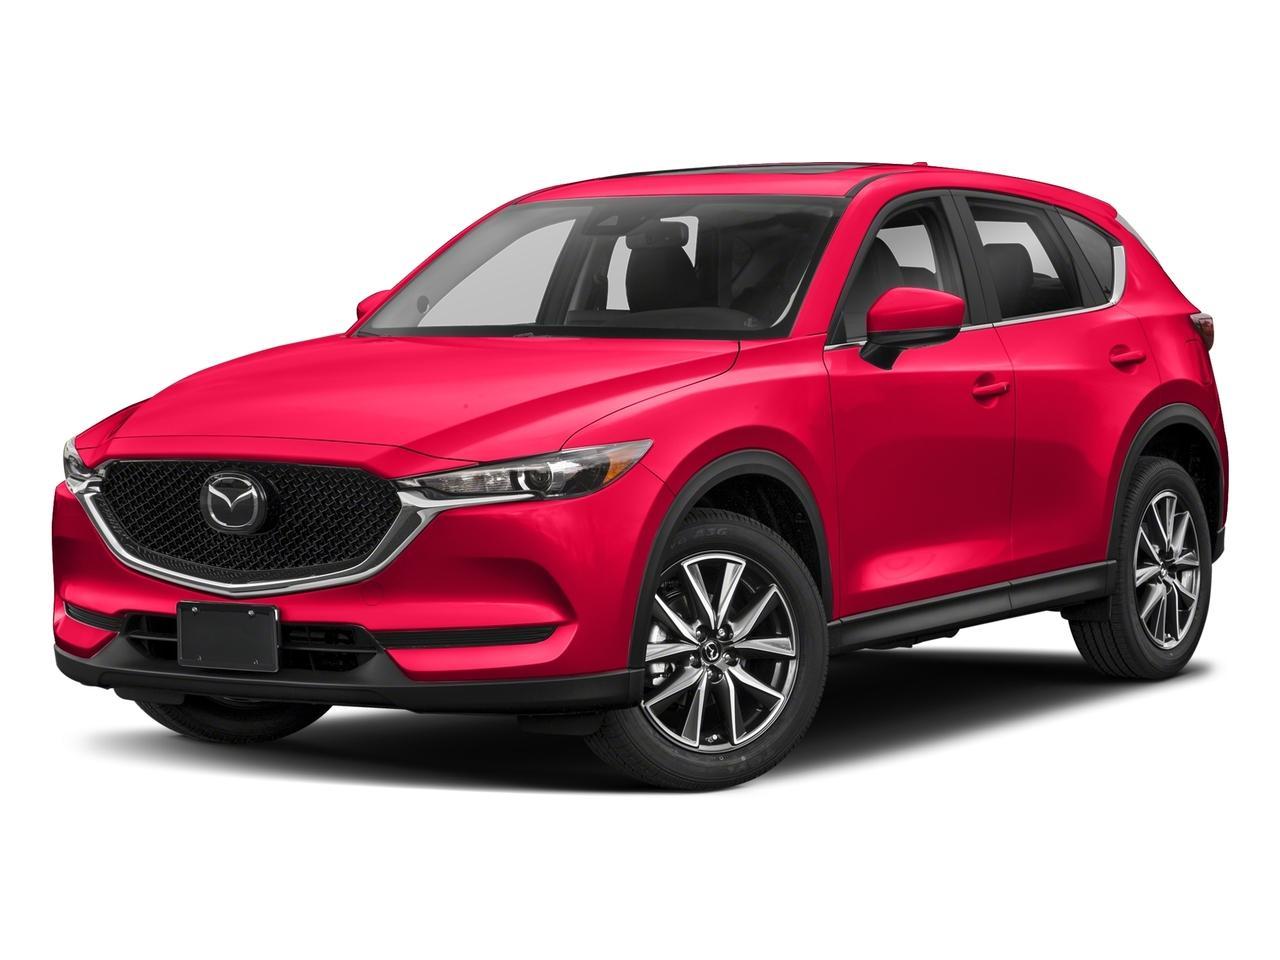 2018 Mazda CX-5 Vehicle Photo in Milton, FL 32570